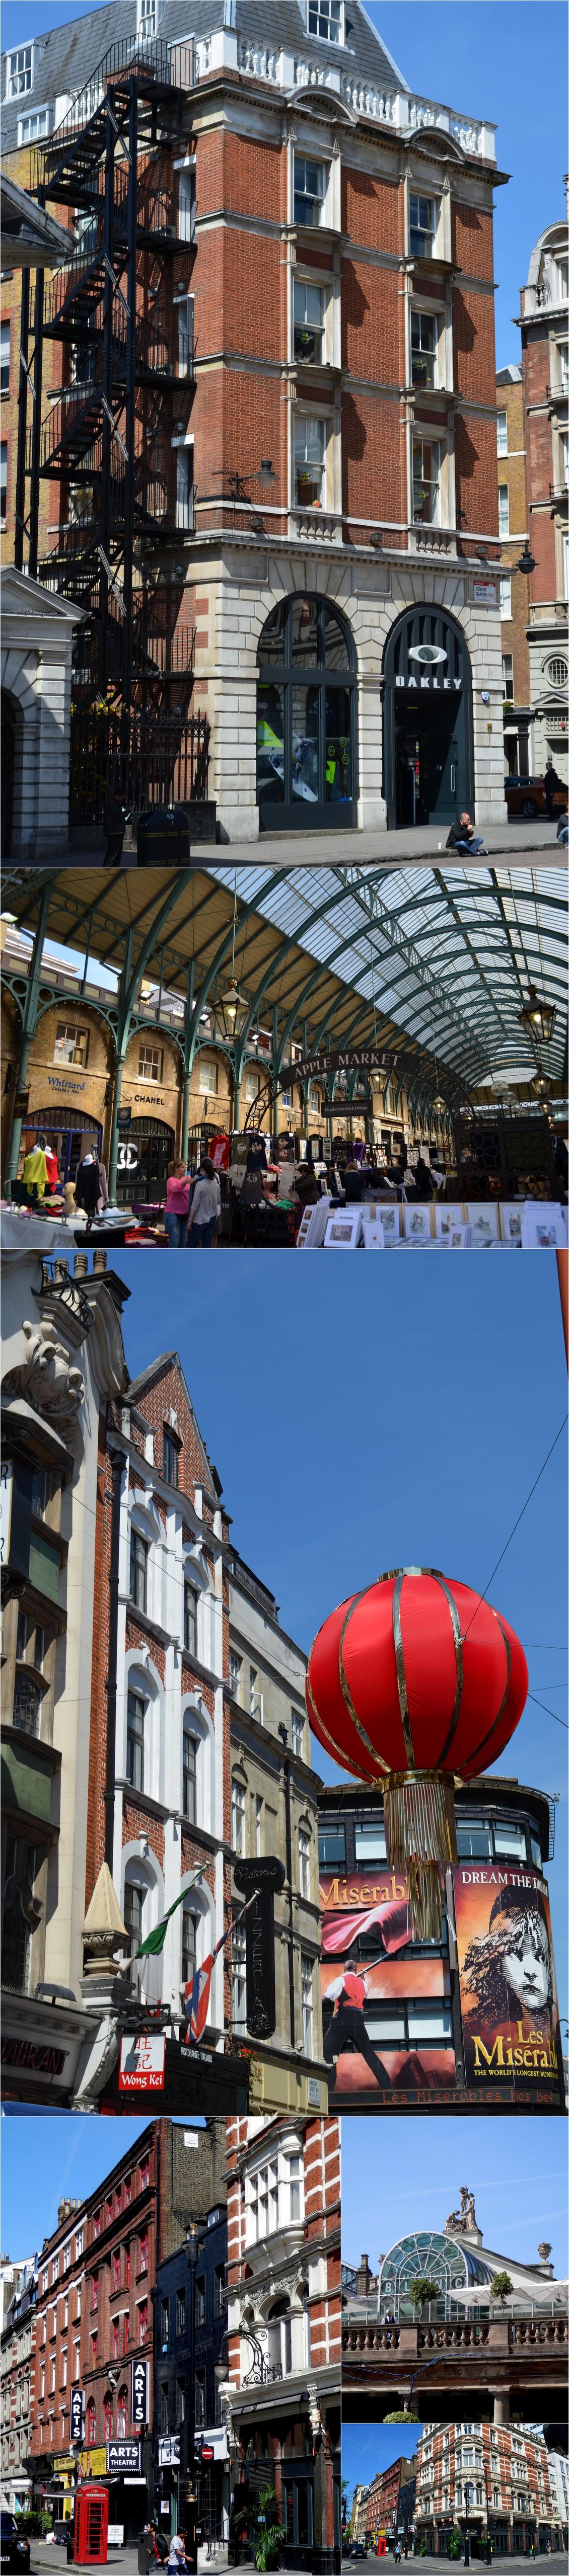 Londres Montage 1